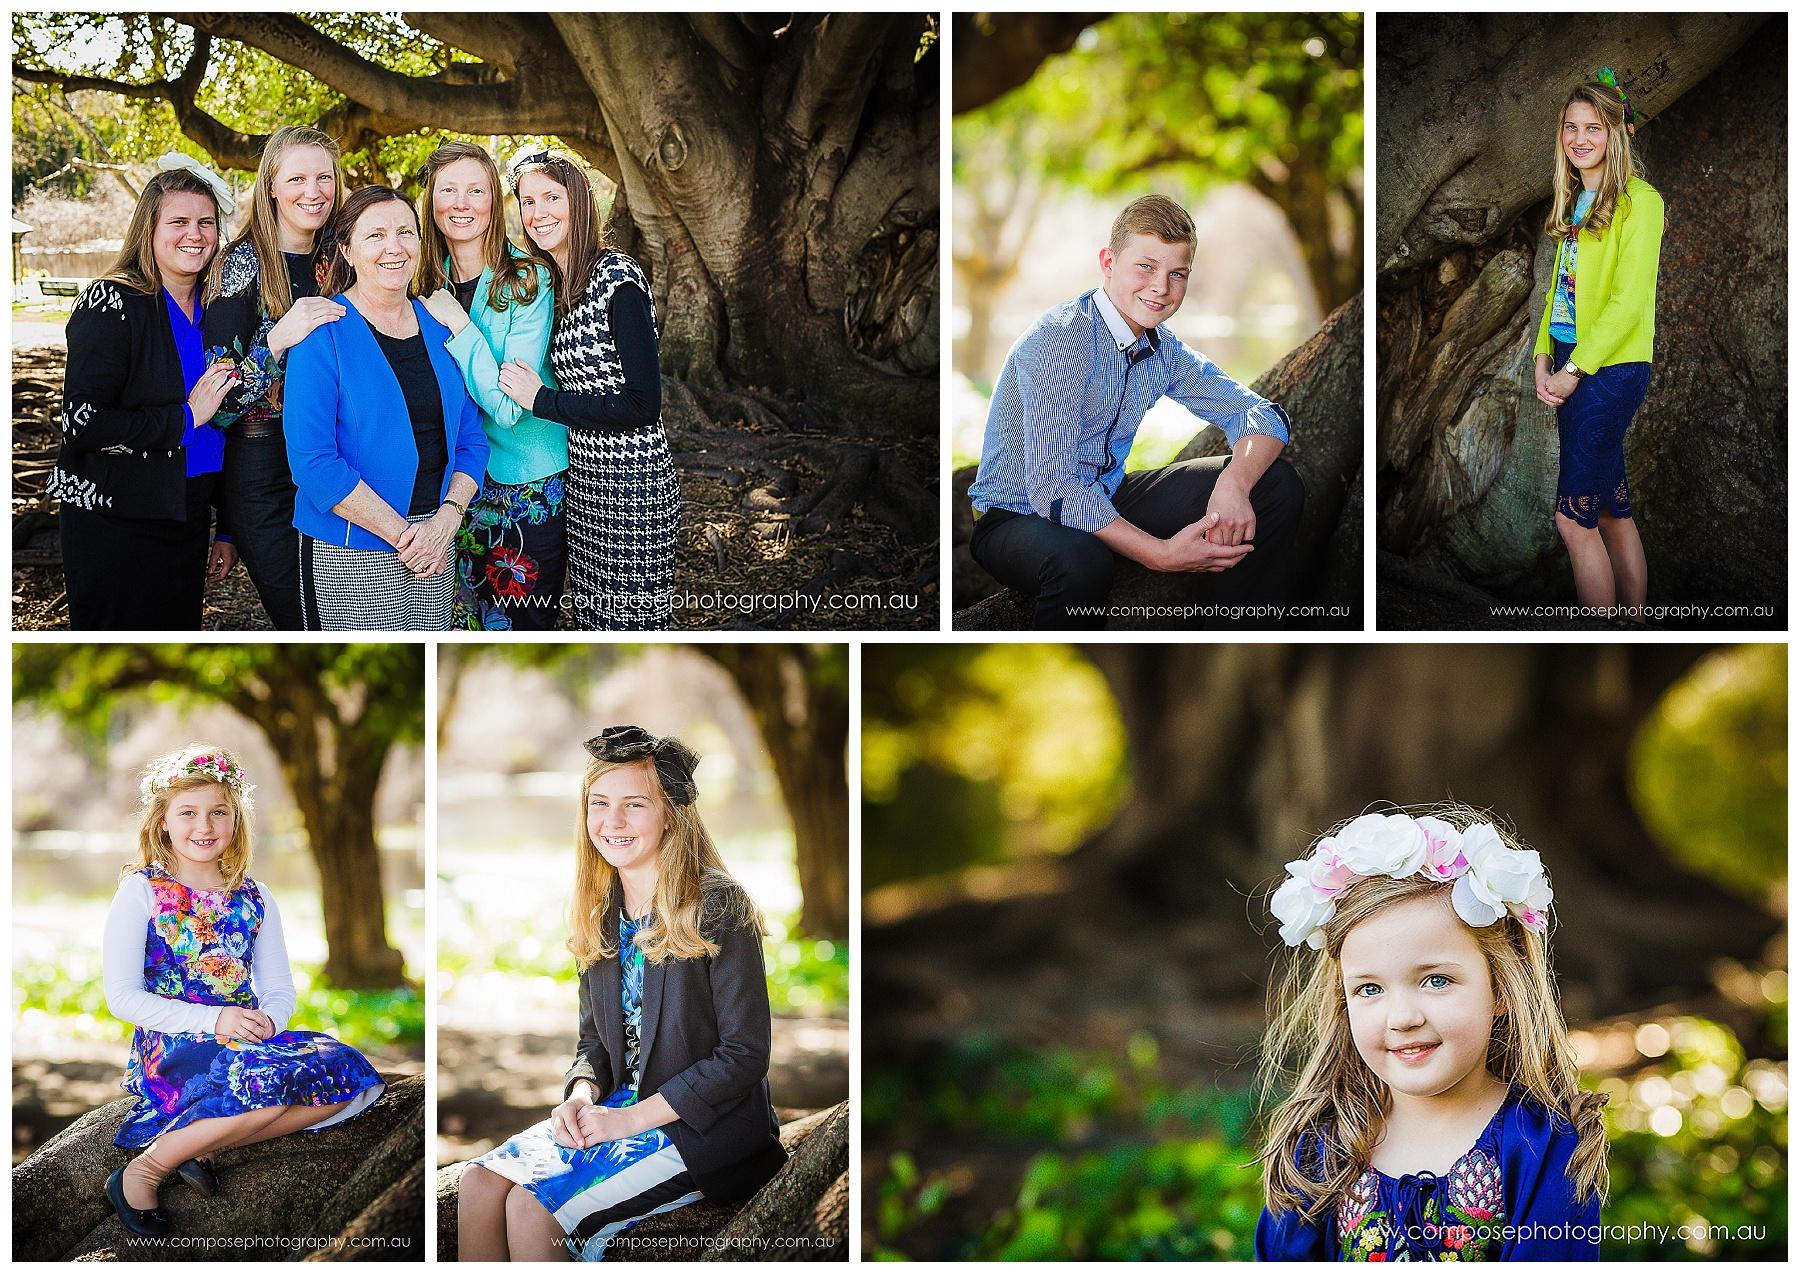 family portrait photographer perth